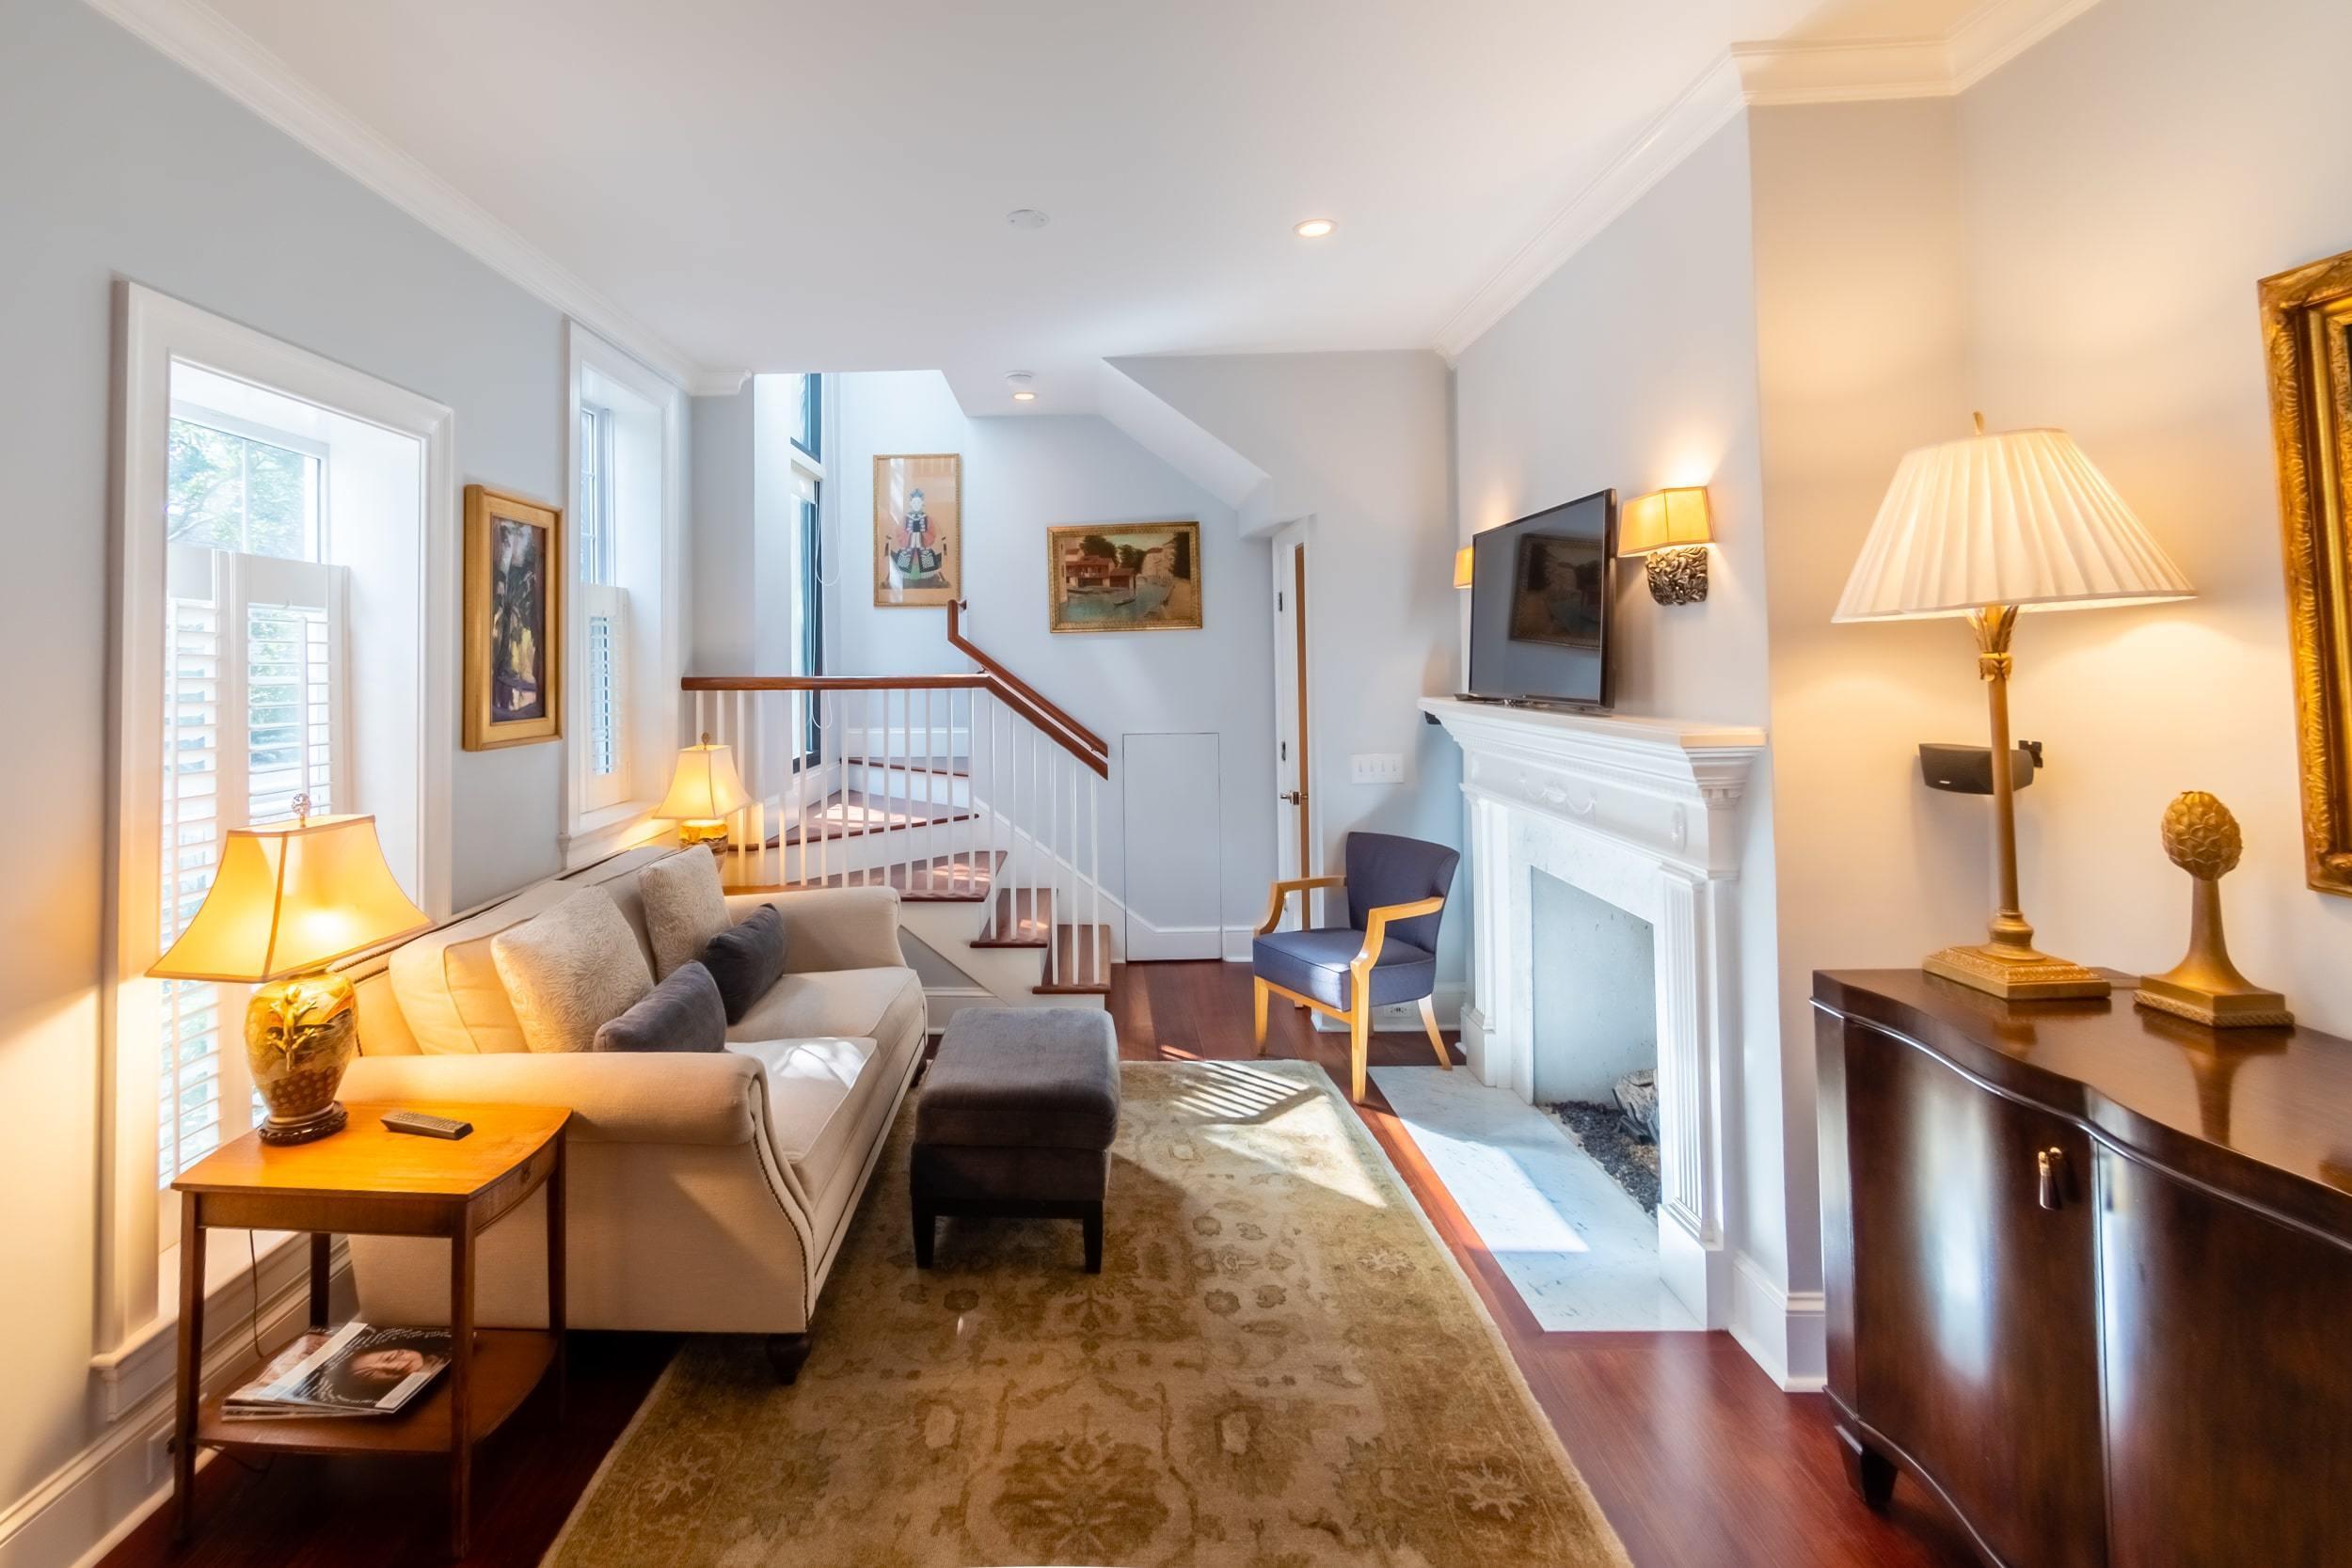 Harleston Village Homes For Sale - 7 Pitt, Charleston, SC - 0